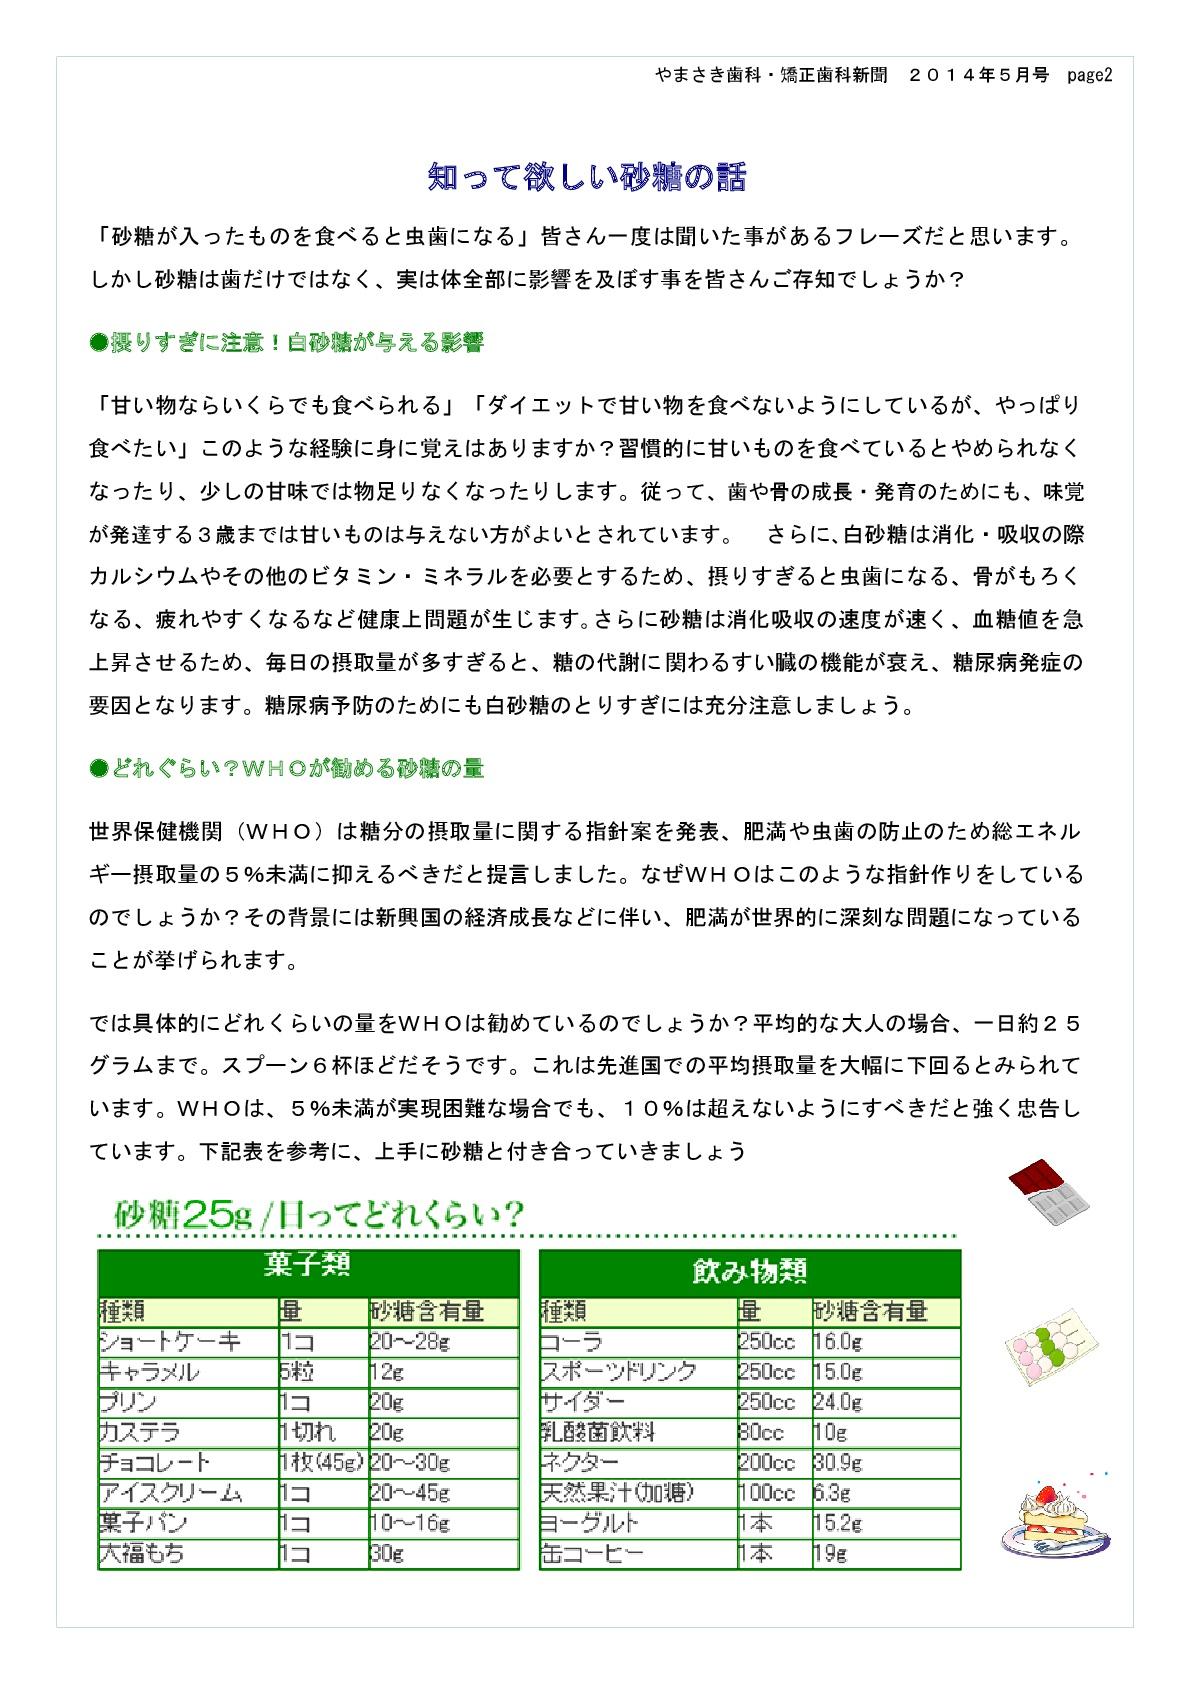 sinbun14-5-2-001